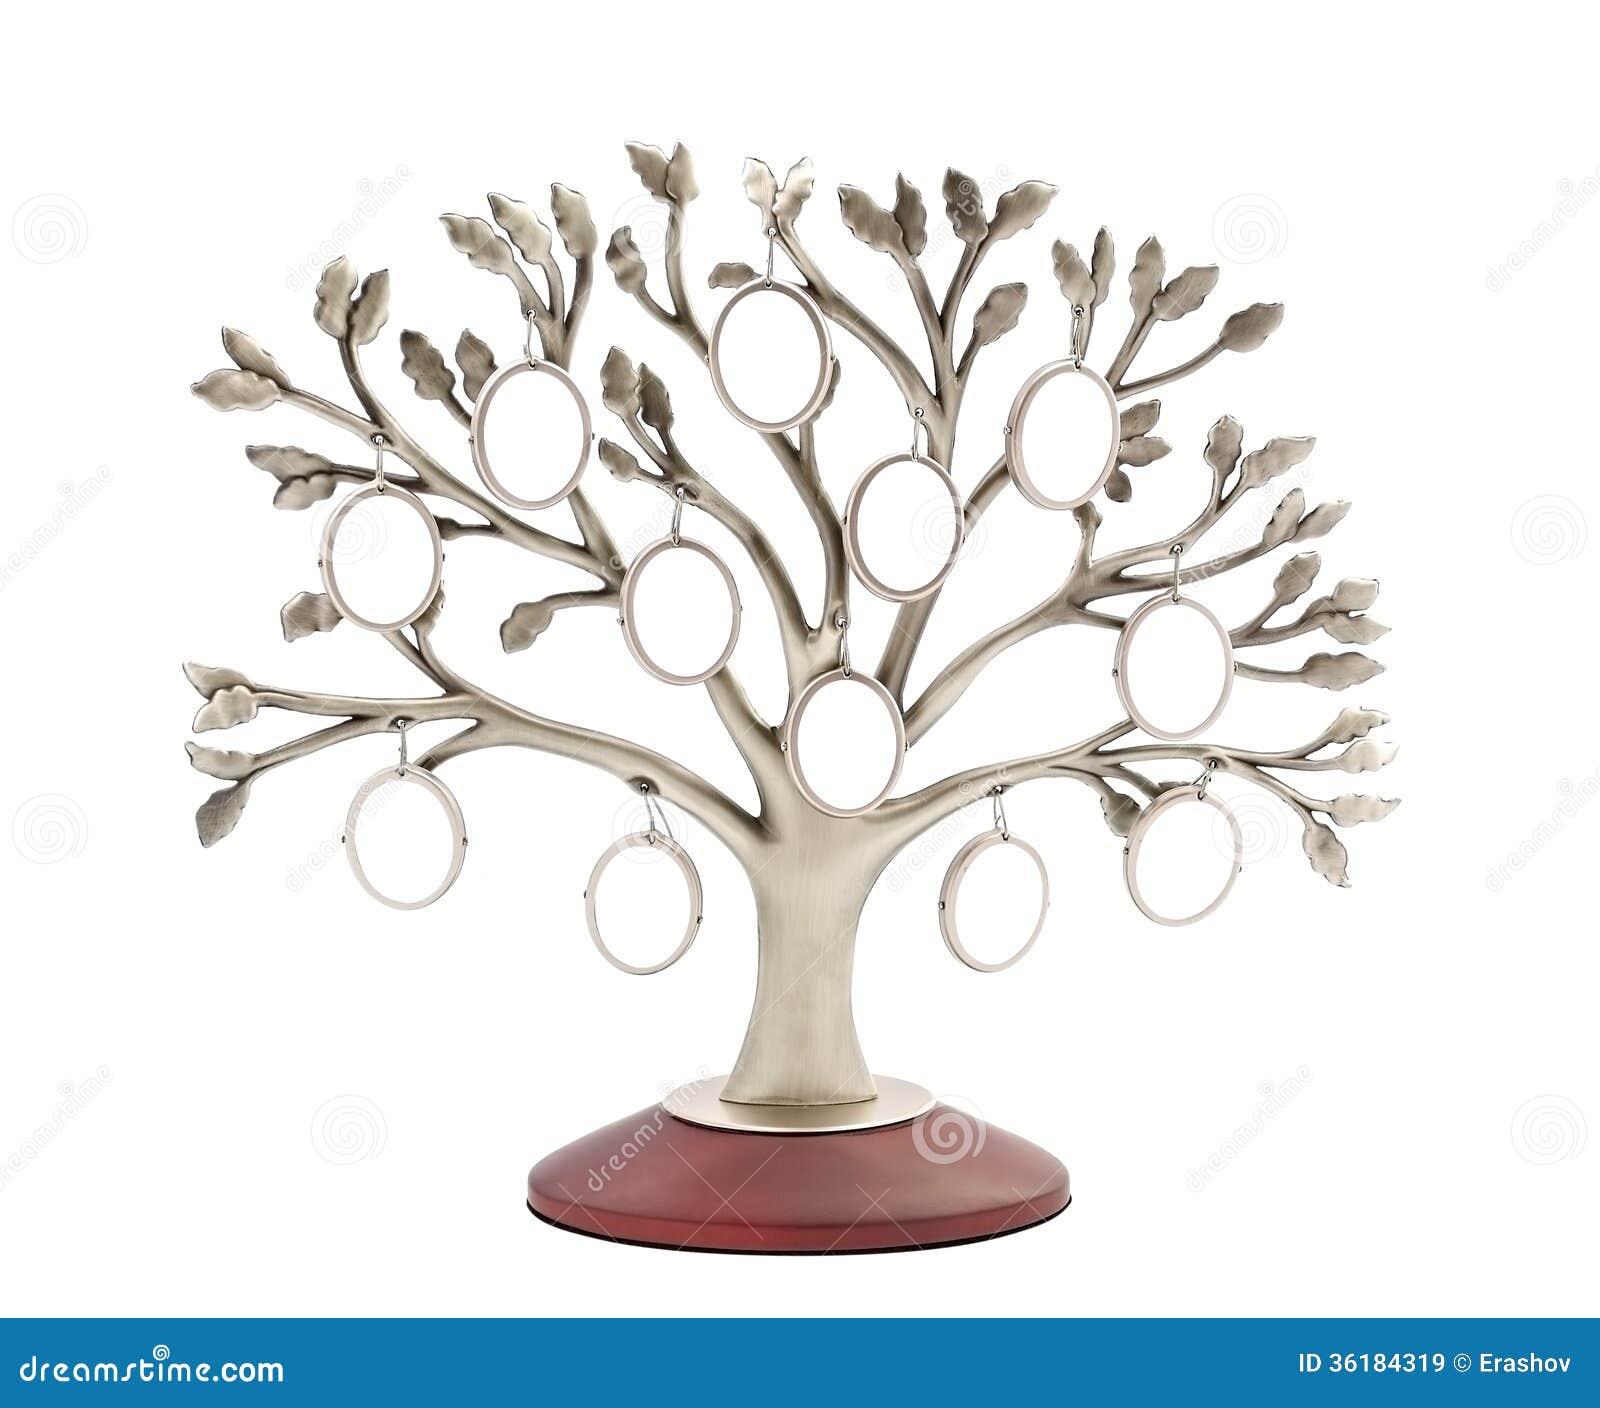 arbol genealogico para imprimir - Vatoz.atozdevelopment.co